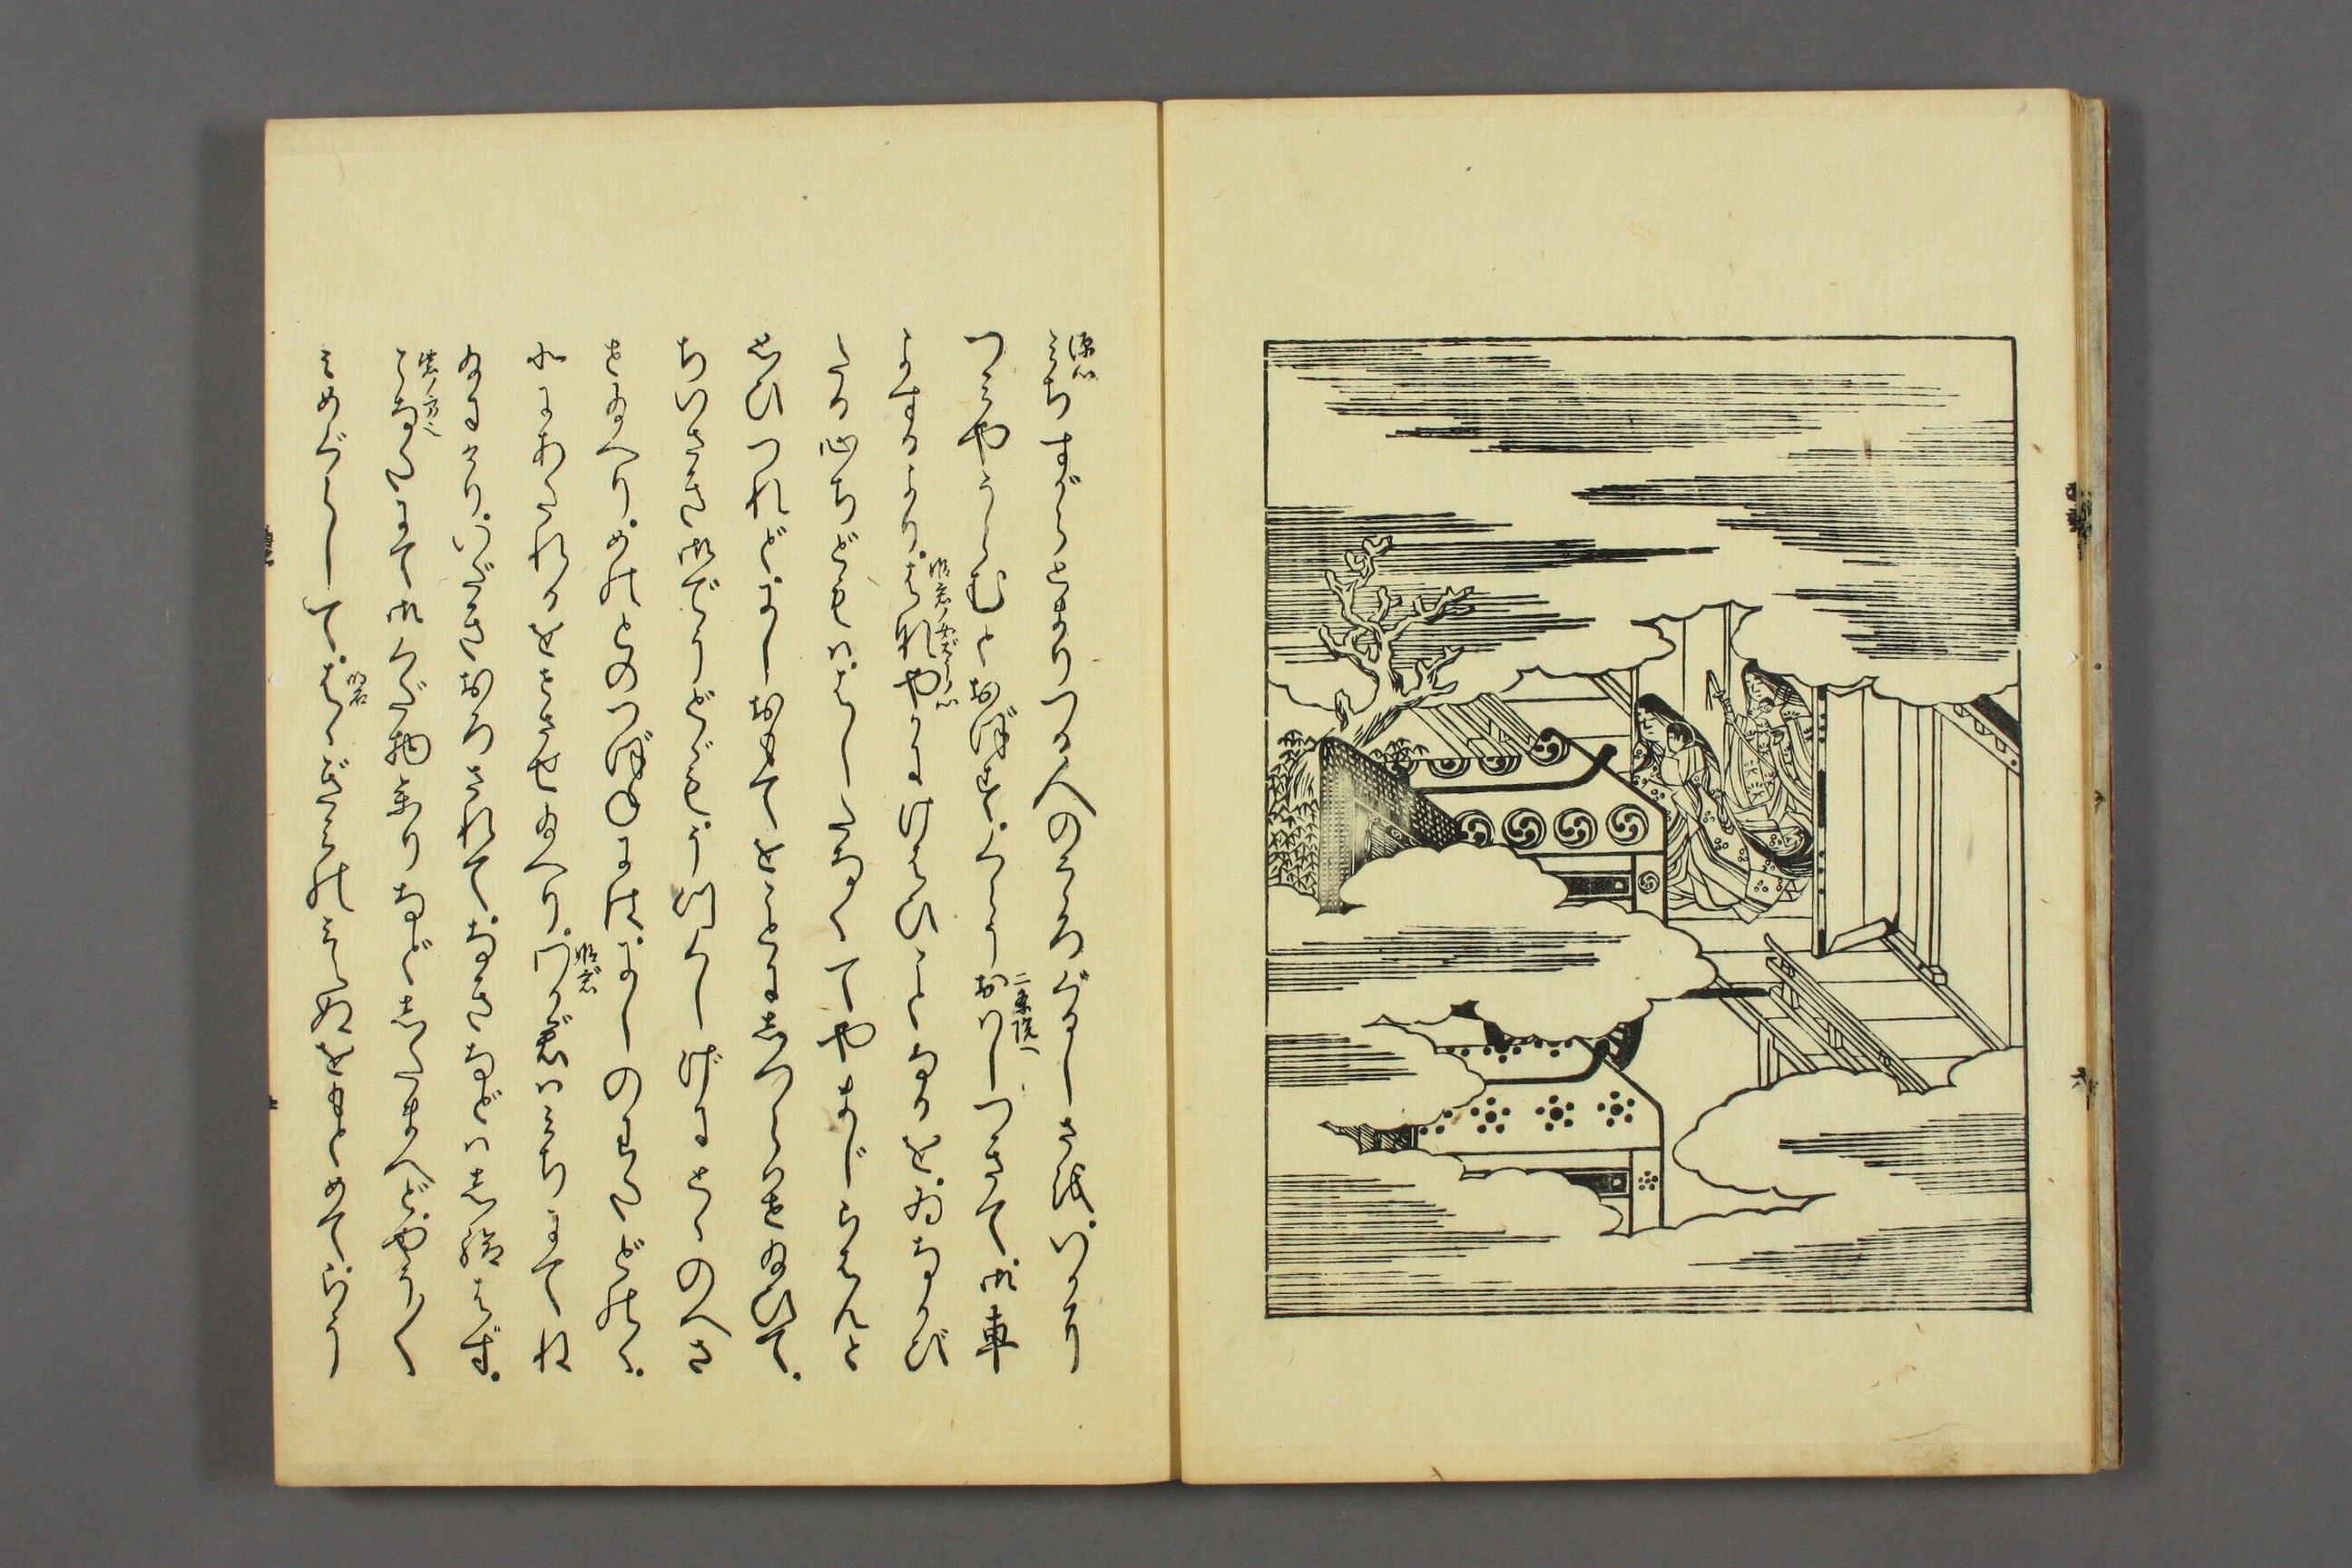 http://archive.wul.waseda.ac.jp/kosho/bunko30/bunko30_a0007/bunko30_a0007_0019/bunko30_a0007_0019_p0008.jpg